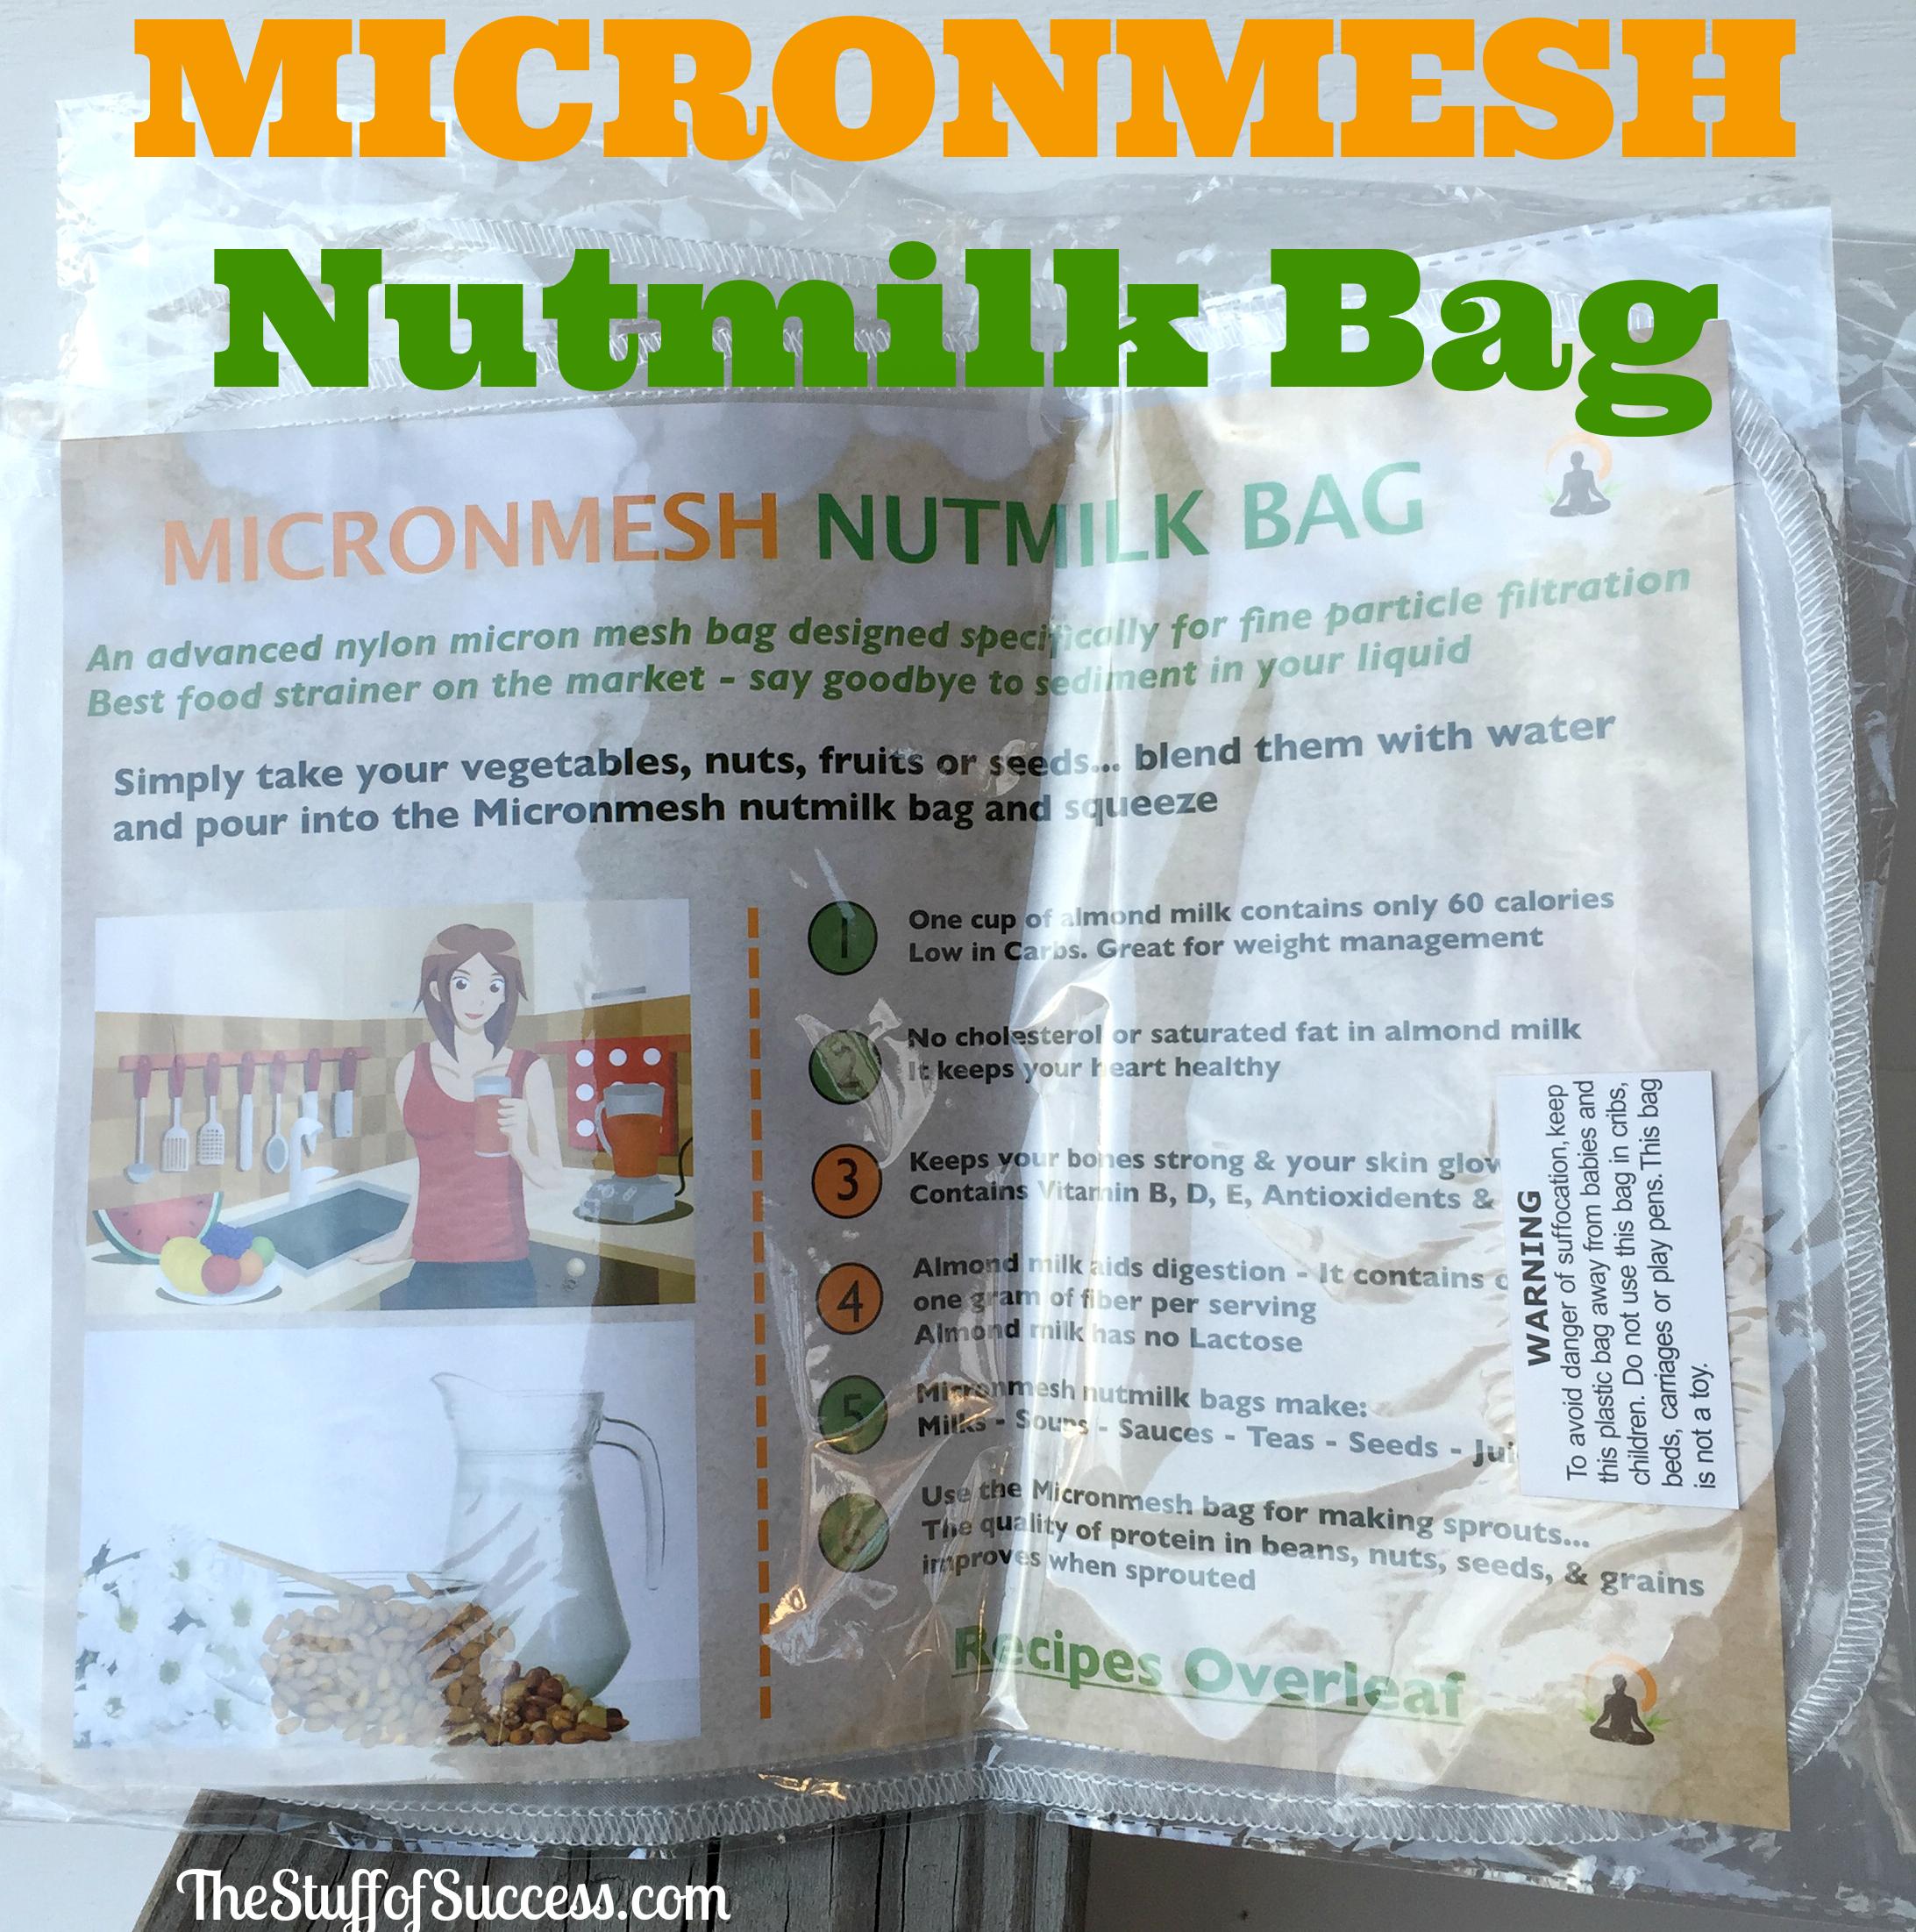 Micronmesh Nutmilk Bag